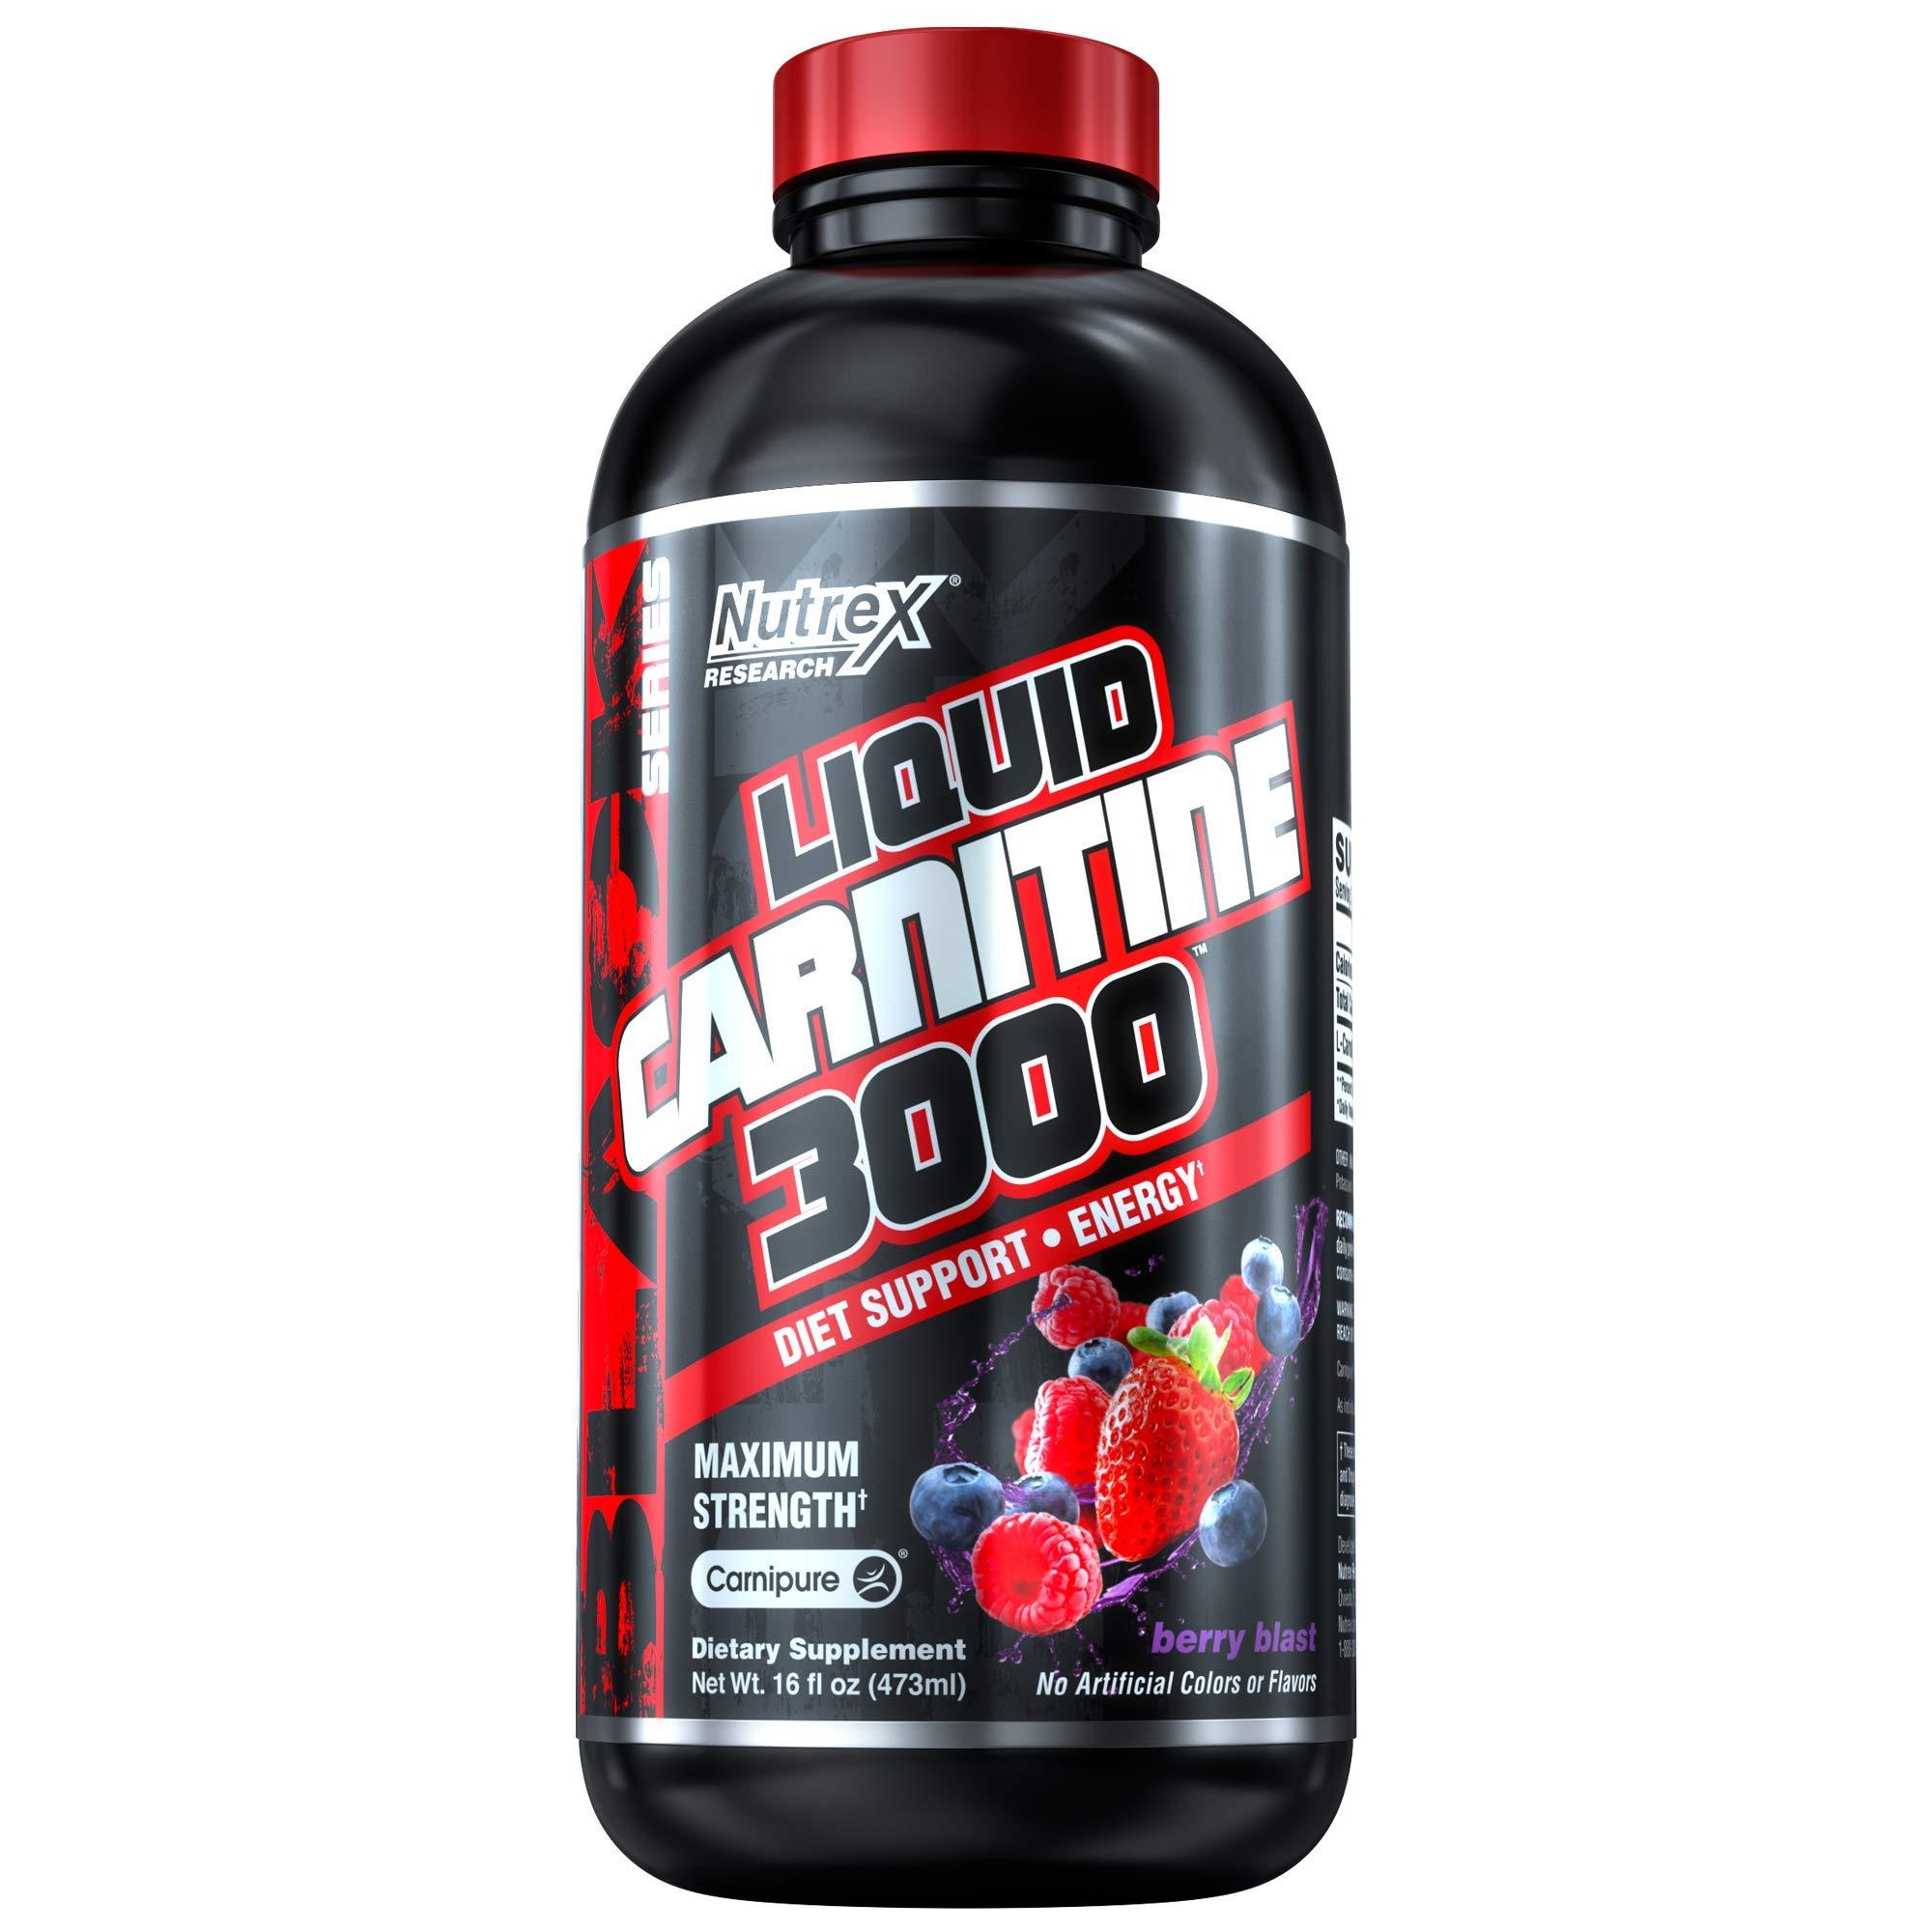 Nutrex Research Liquid Carnitine 3000 | Premium Liquid Carnitine, Stimulant Free, Fat Loss Support | Berry Blast by Nutrex Research